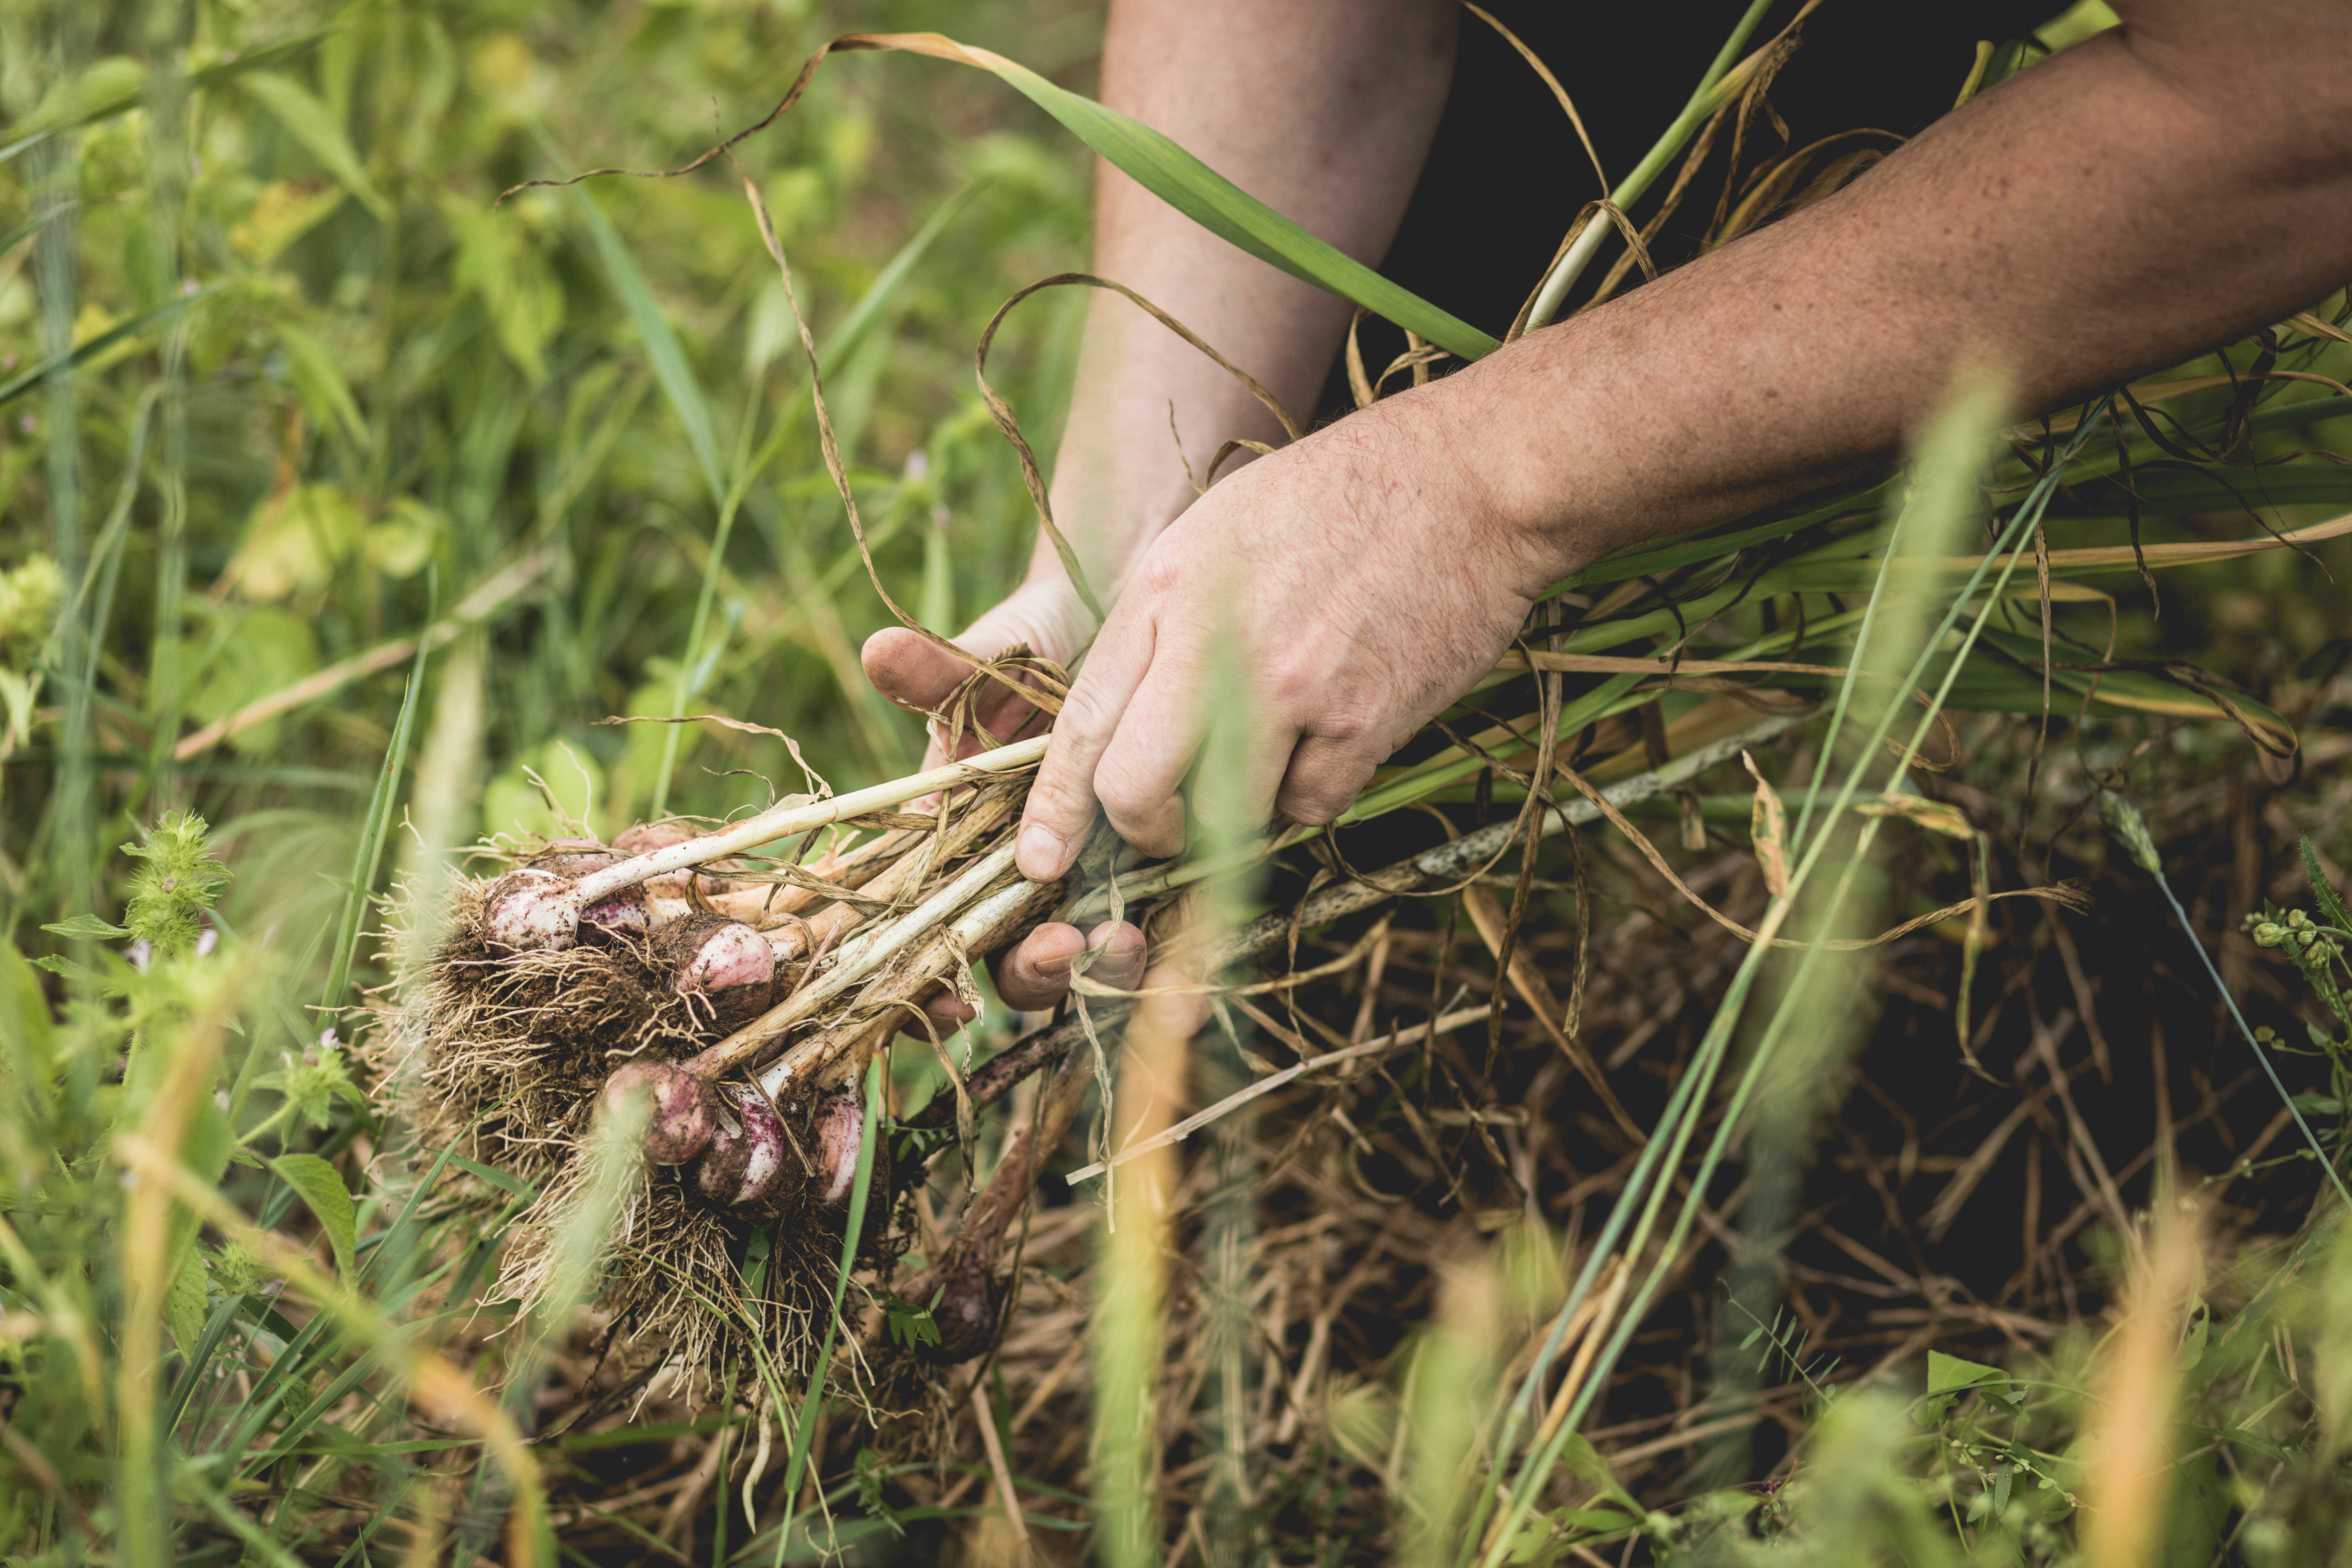 Handful of freshly picked garlic in the field P2 F6 NR5 wr